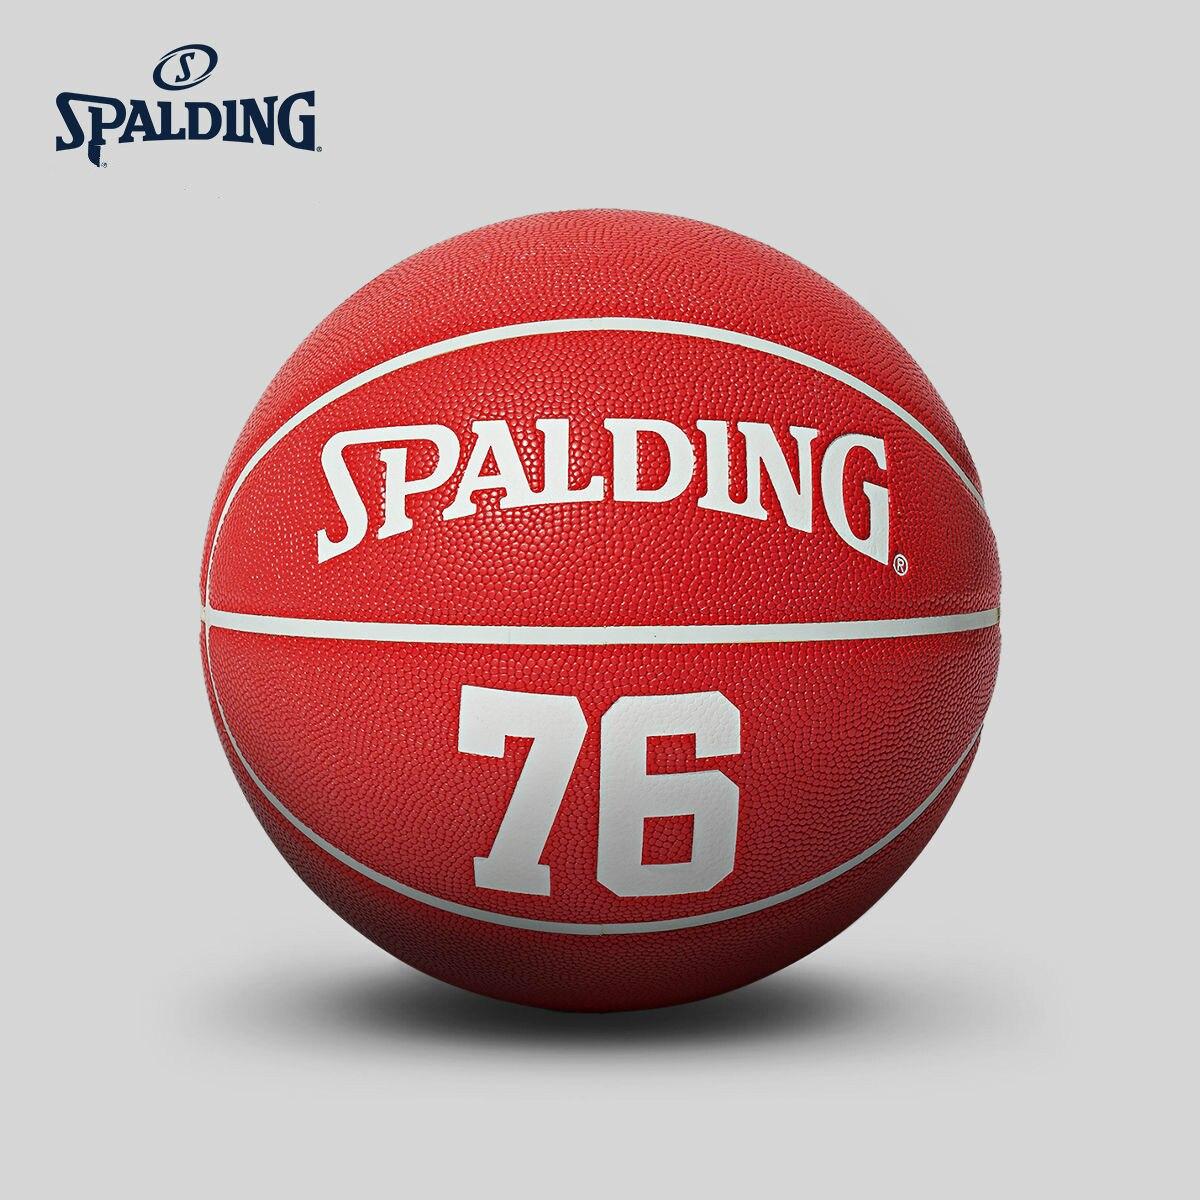 Original SPALDING Standard  Red Basketball PU No. 7 Men Basketbol Ball 76-705Y Baloncesto basketball